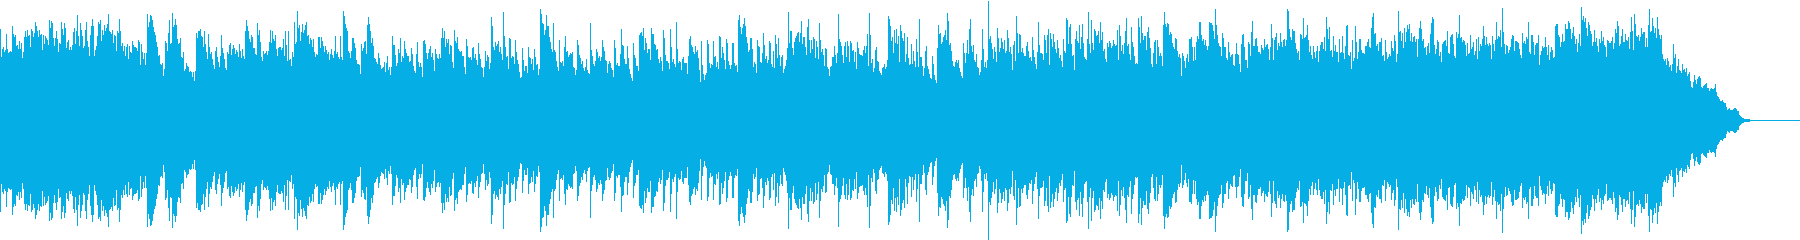 Wedding, impression, reunion, pass, joy, blessing, etc.'s reproduced waveform